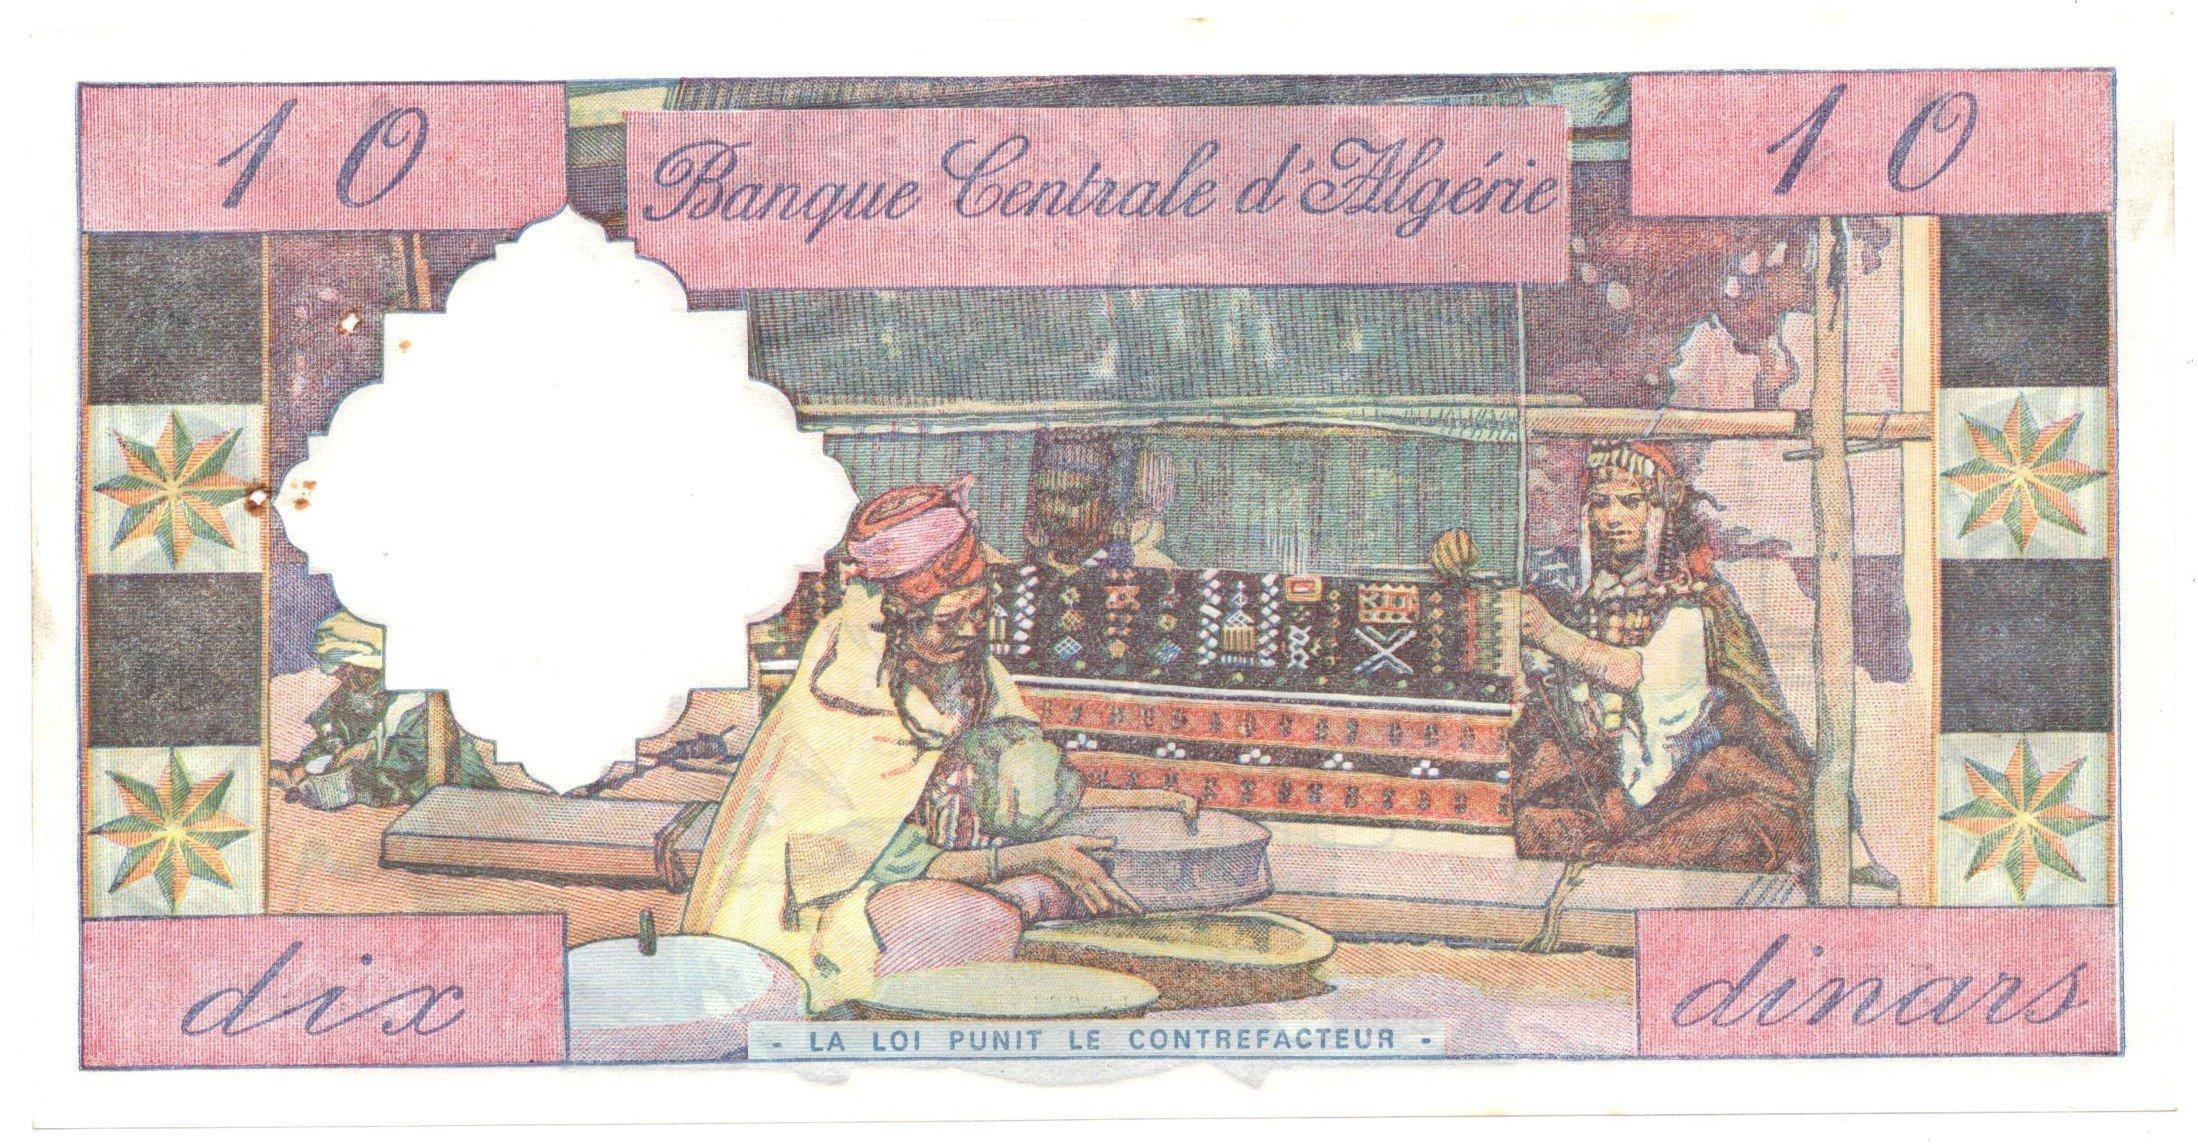 Algeria 5 dinars 1964 back